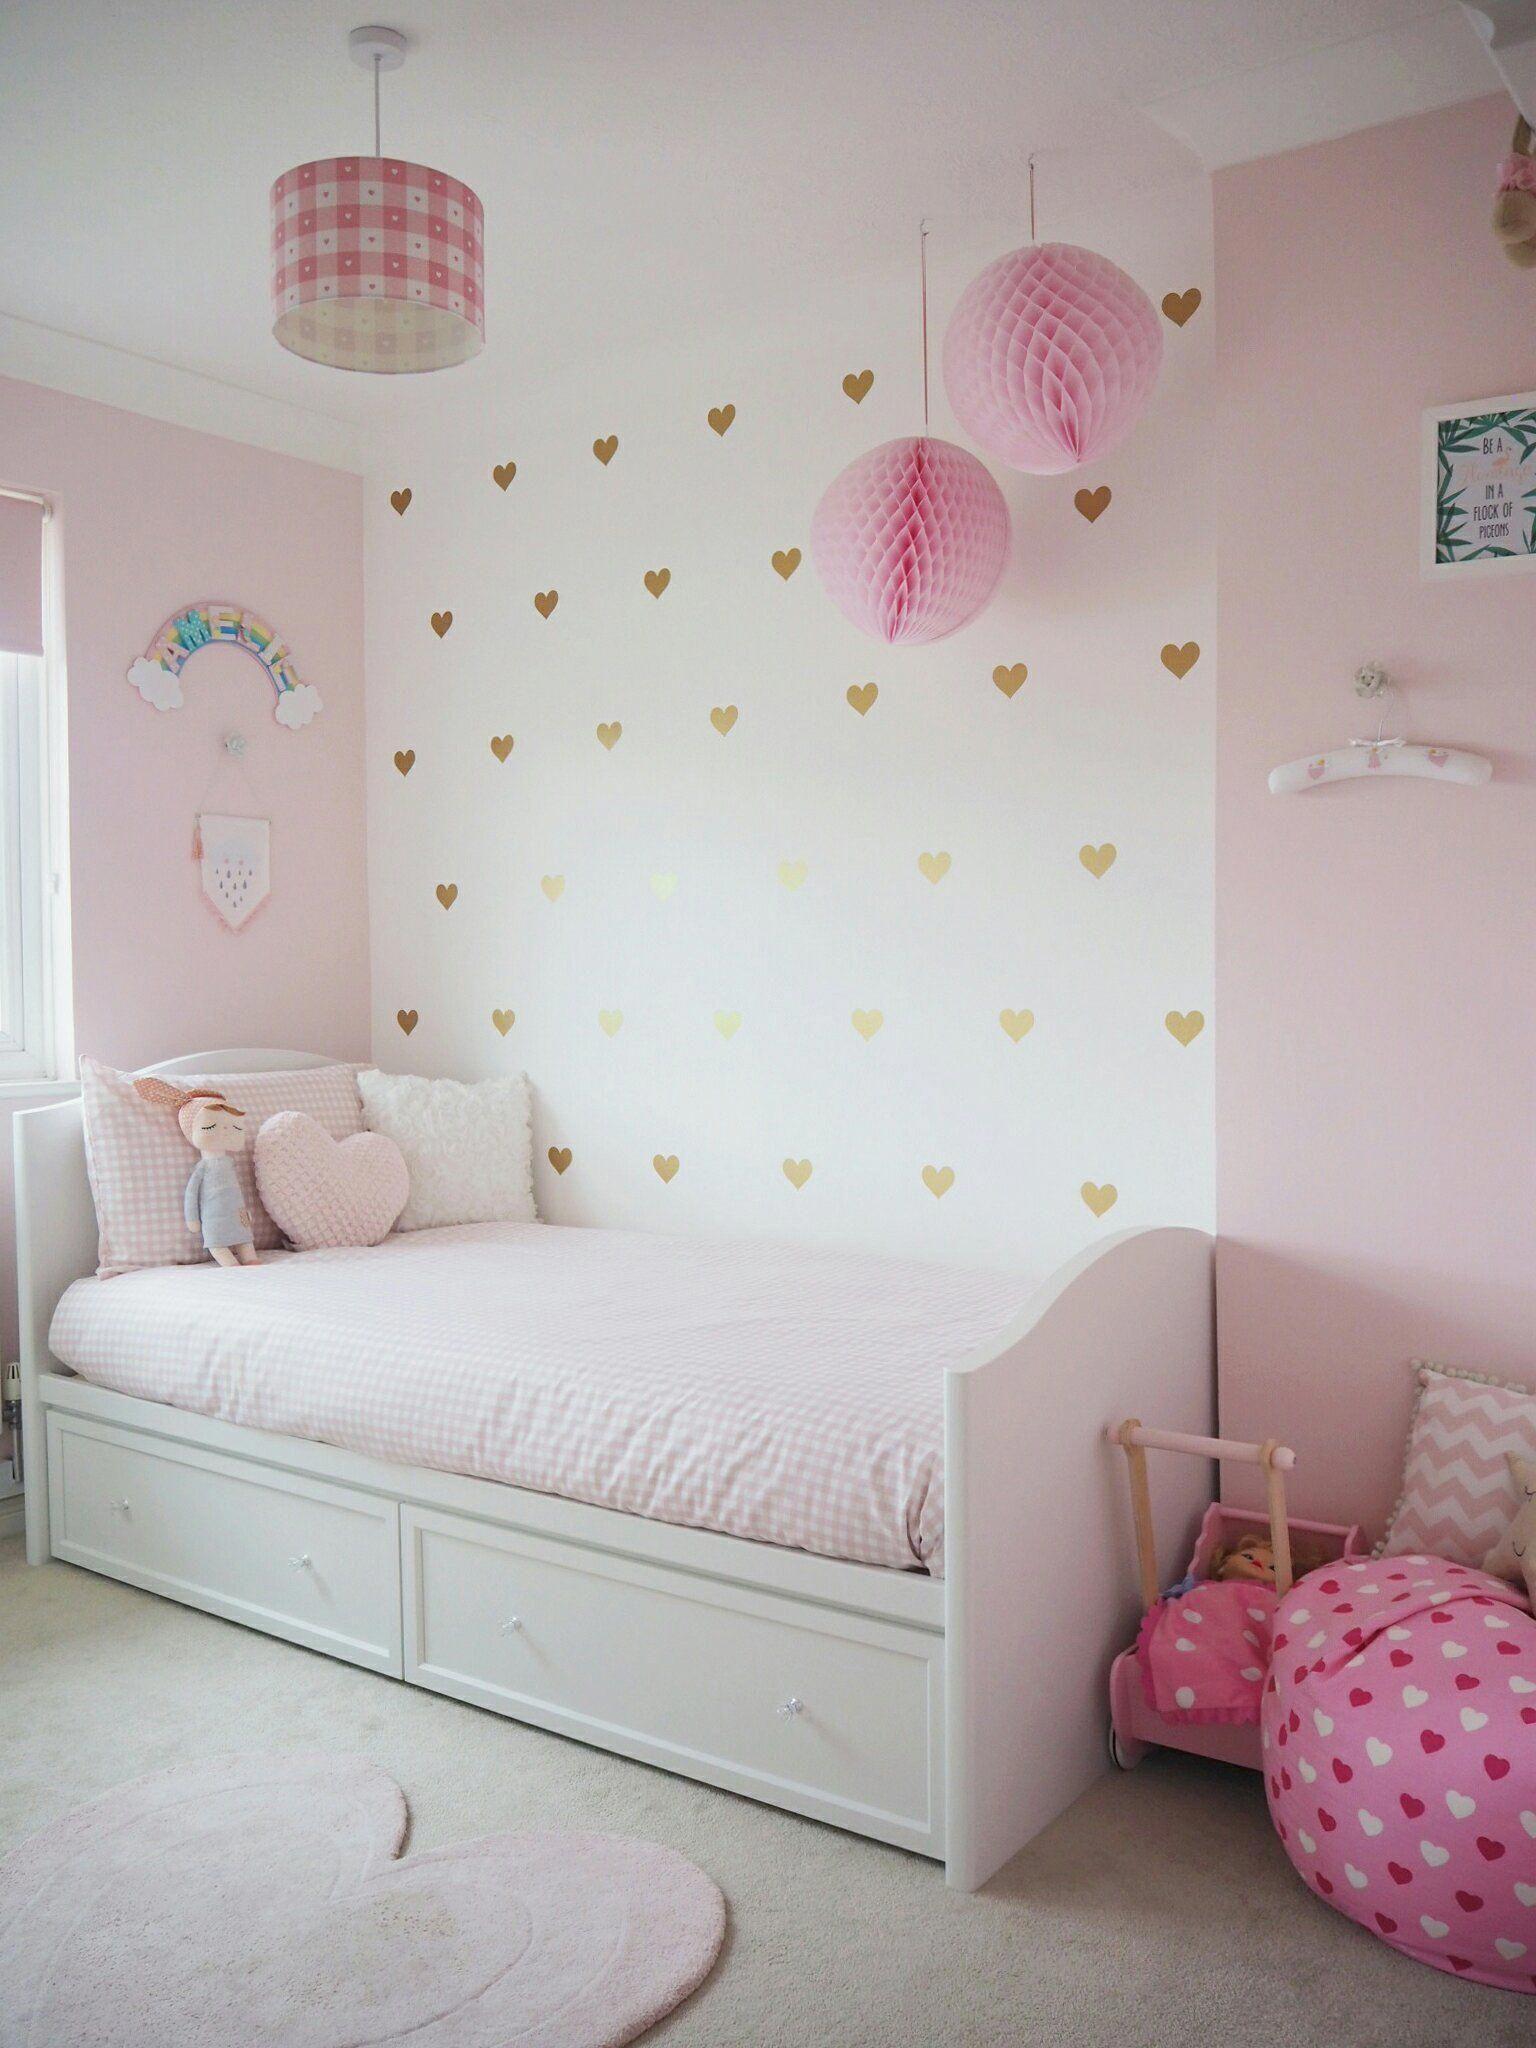 32 Impresionante Principal De Lujo Estudio Decoraciondelahabitaciondeestarglam Pink Bedroom Decor Bedroom For Girls Kids Pink Bedroom Design